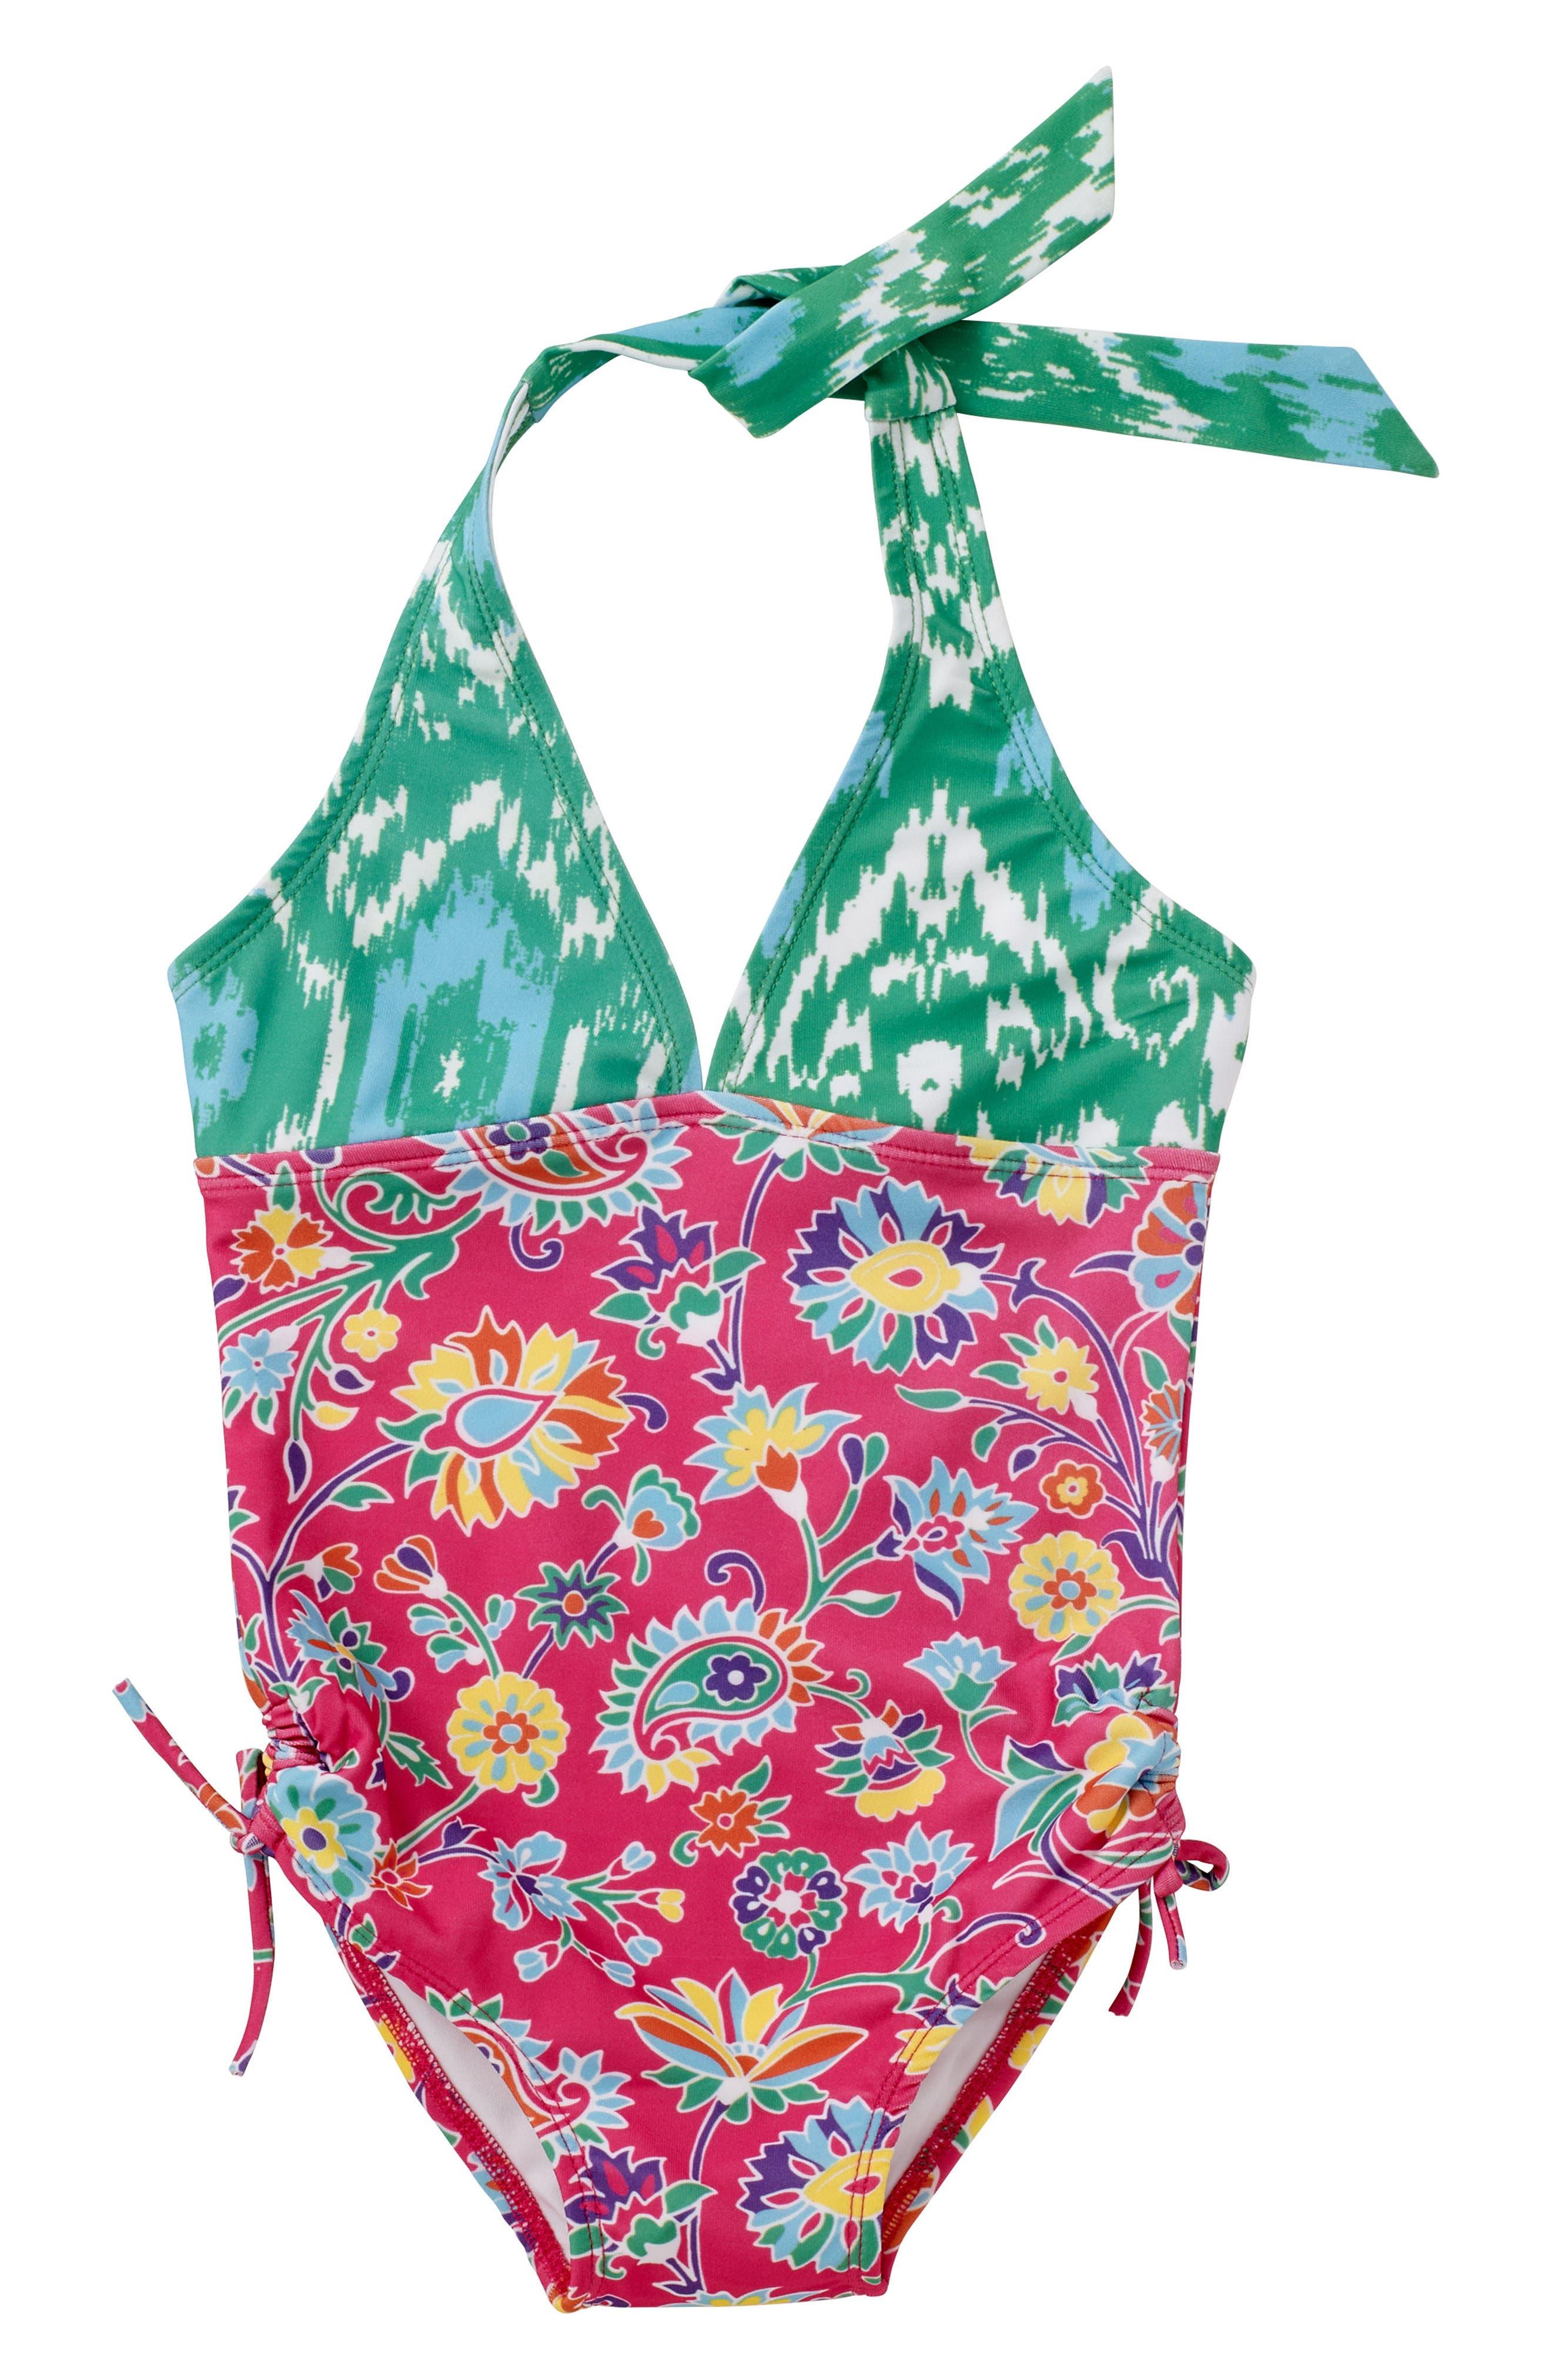 Alternate Image 1 Selected - Masalababy One-Piece Halter Swimsuit (Toddler Girls, Little Girls & Big Girls)